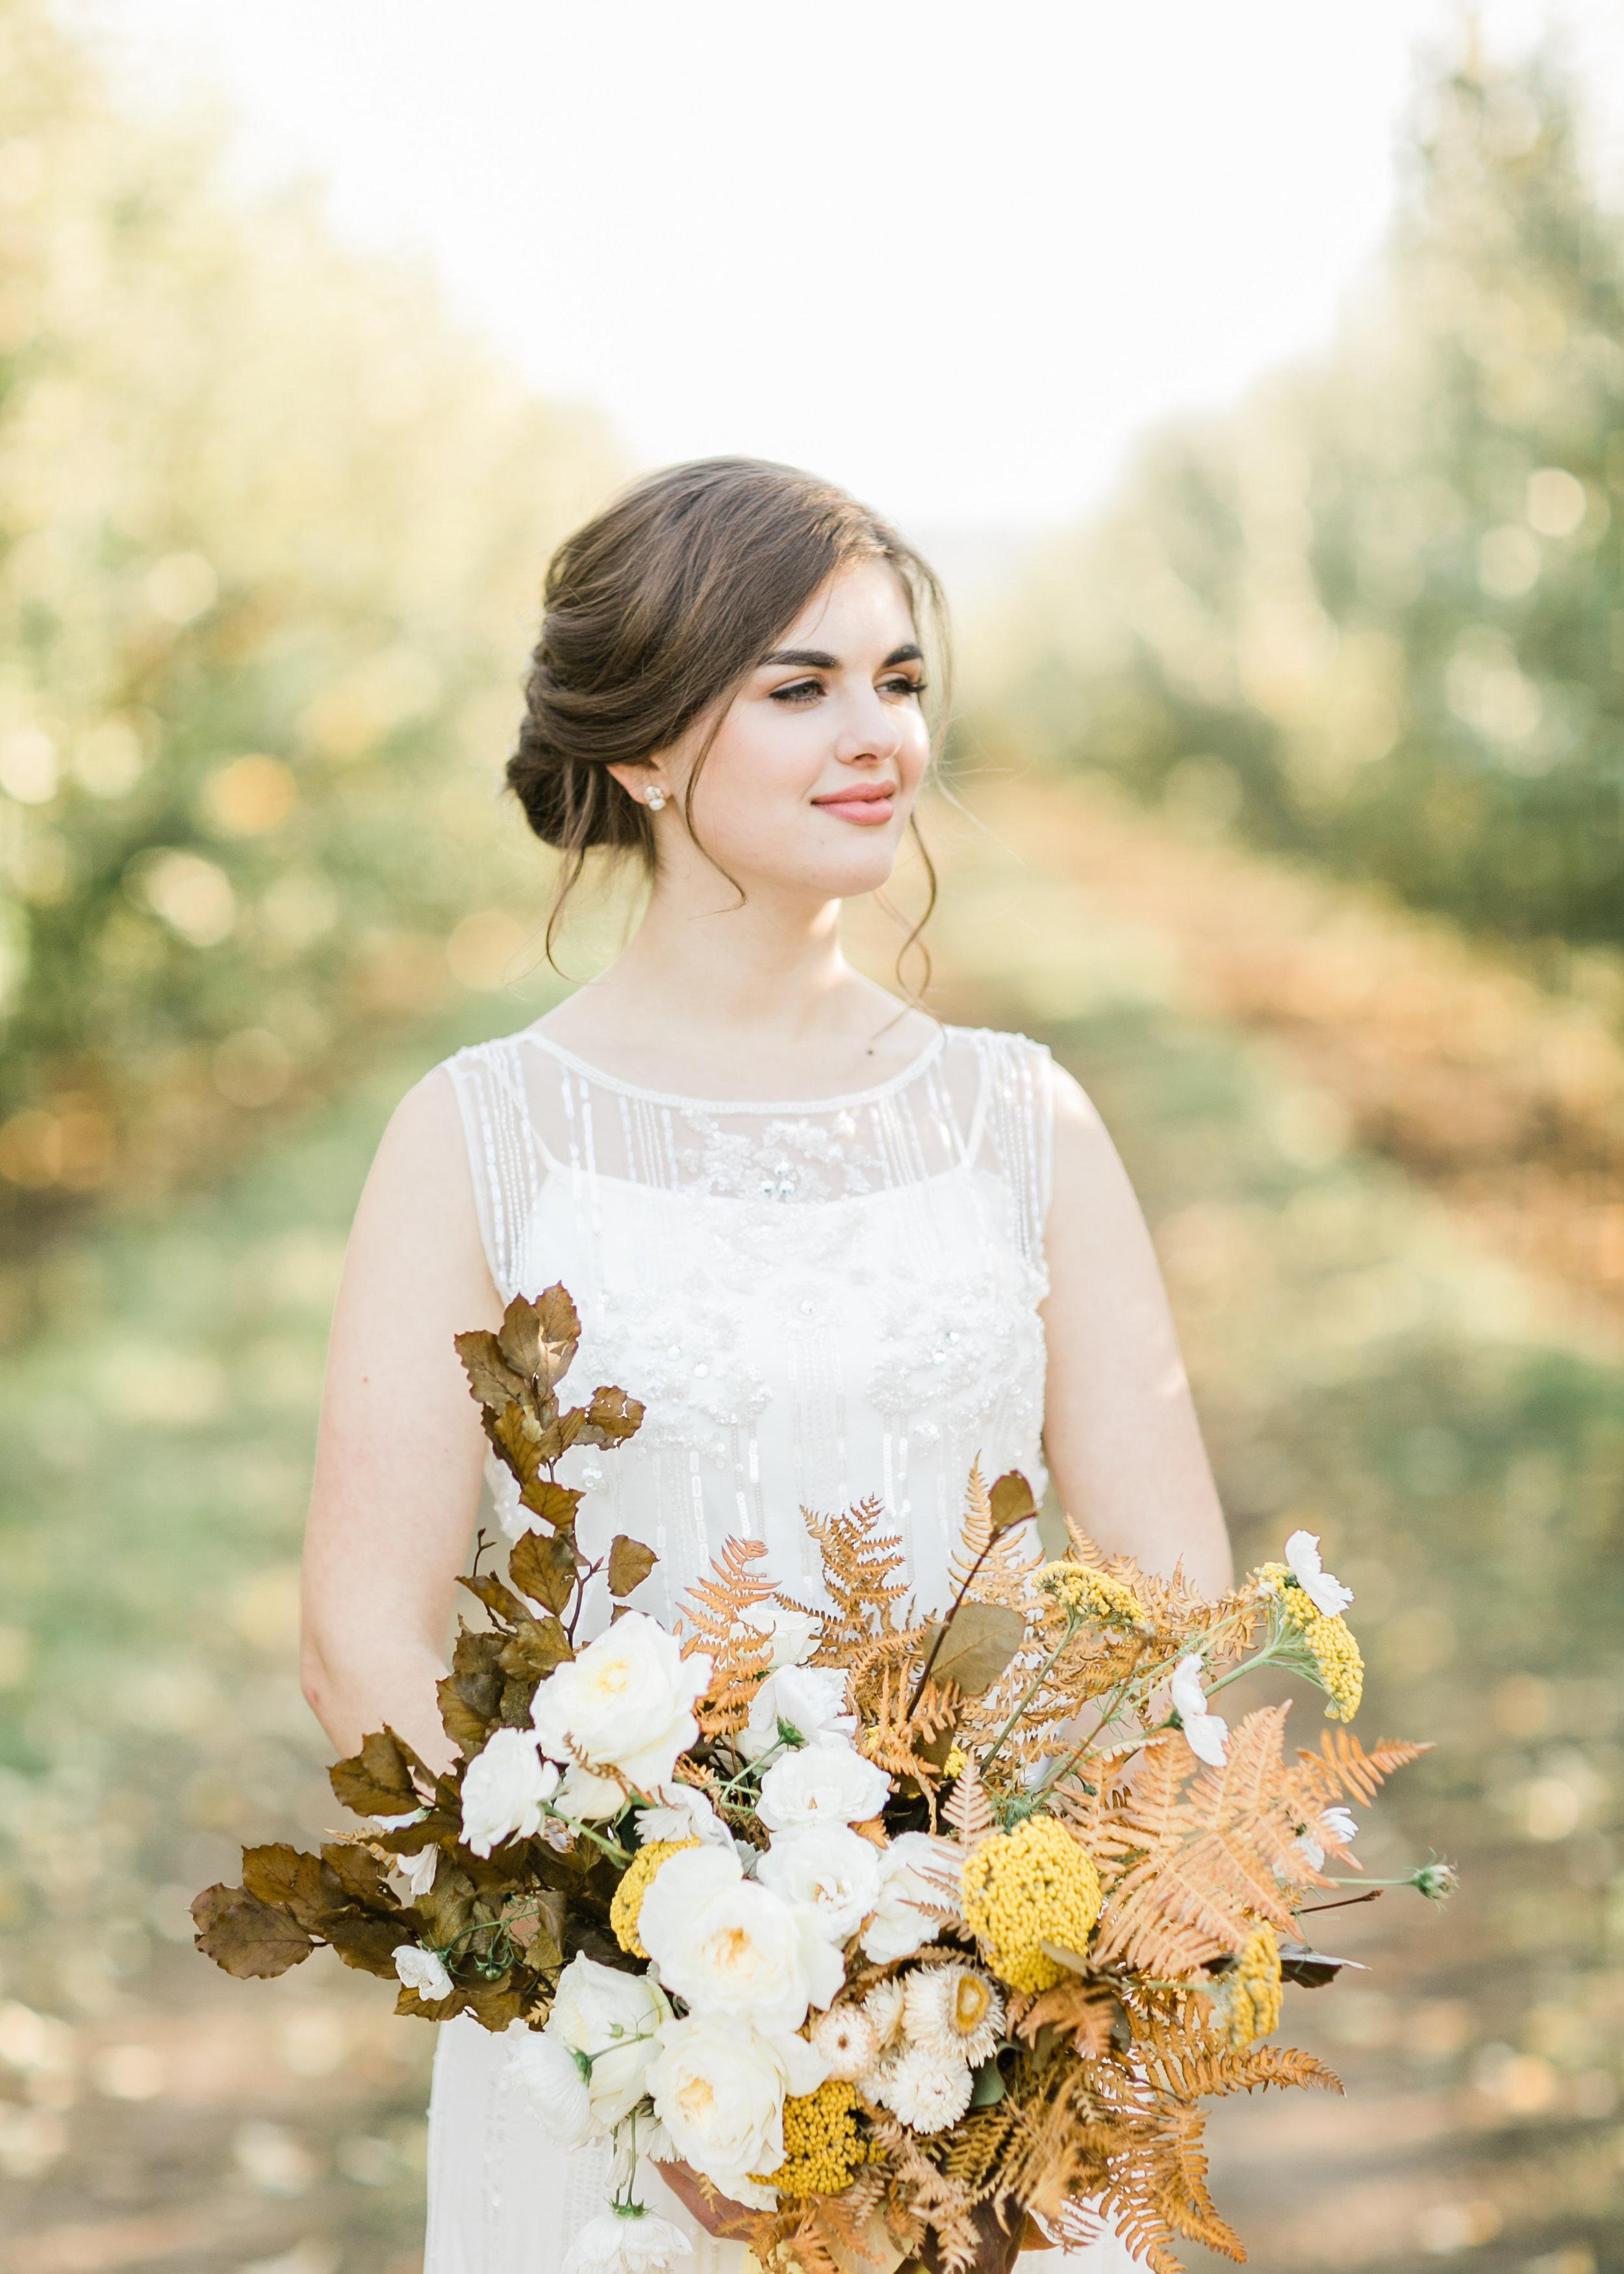 gina-neal-wedding-photography-the-orchard-42.jpg